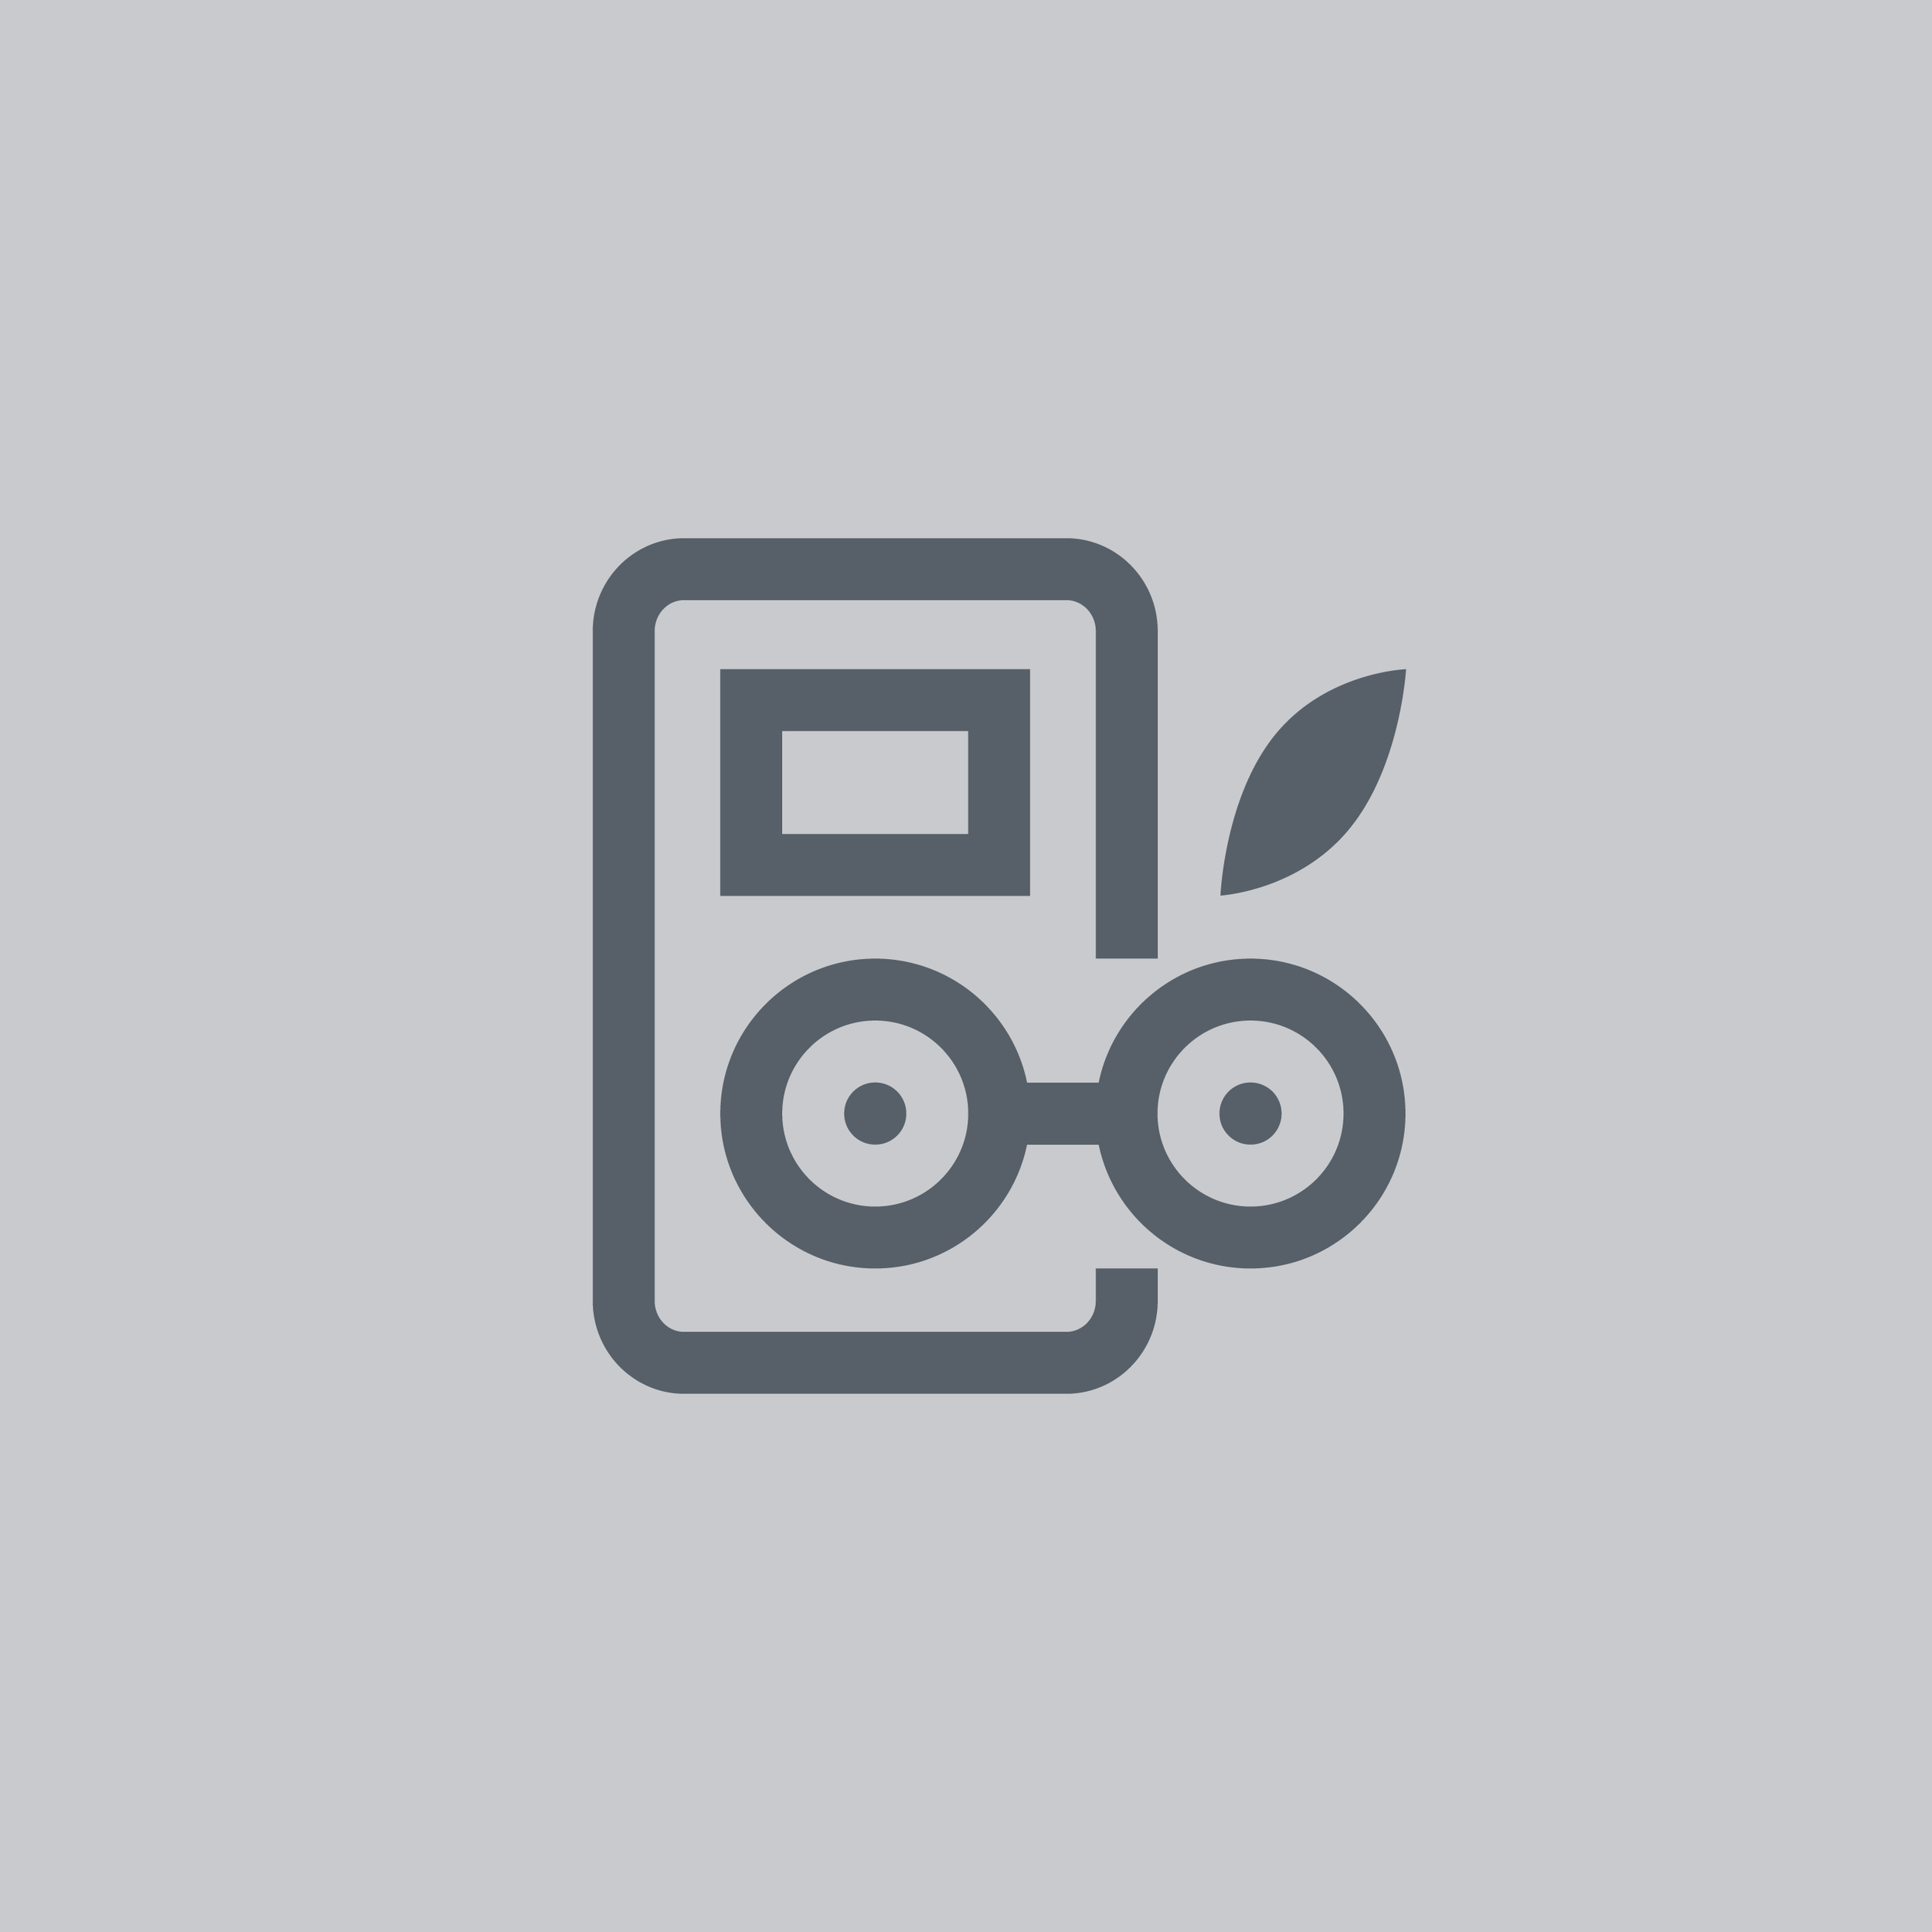 Steve Jobs - iPod - Apple